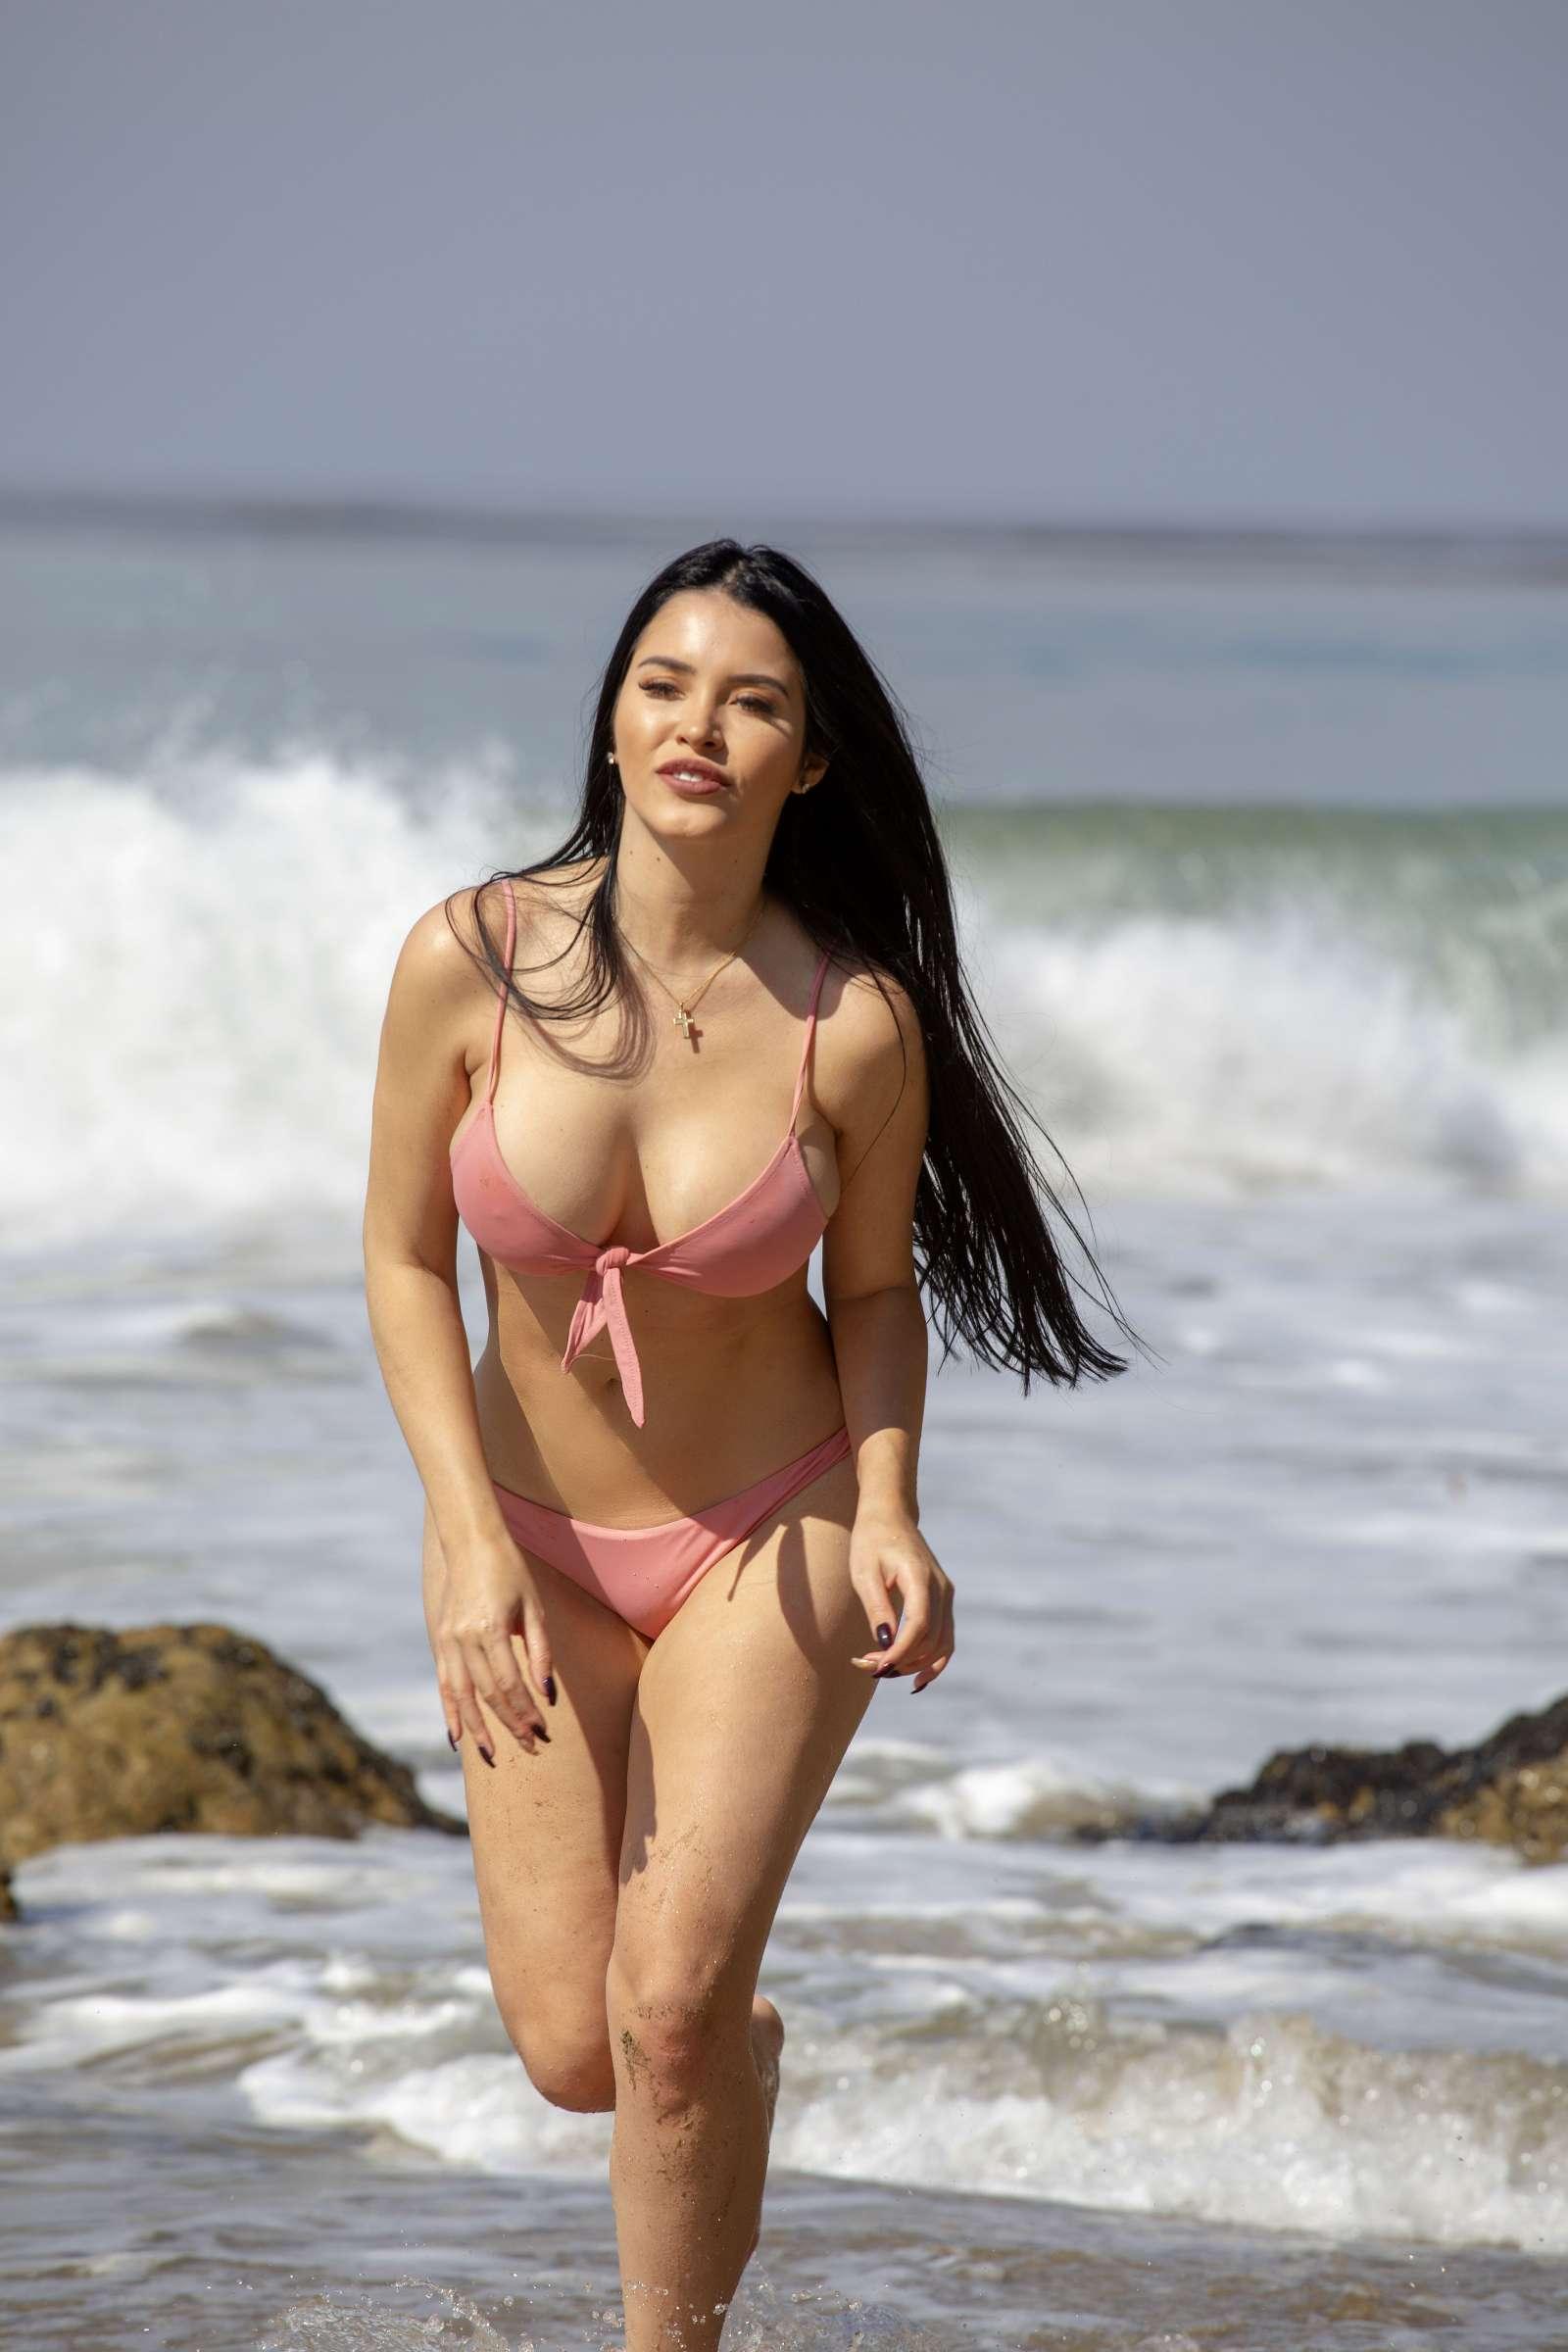 Hilary duff bikini on the beach in malibu - 1 part 3